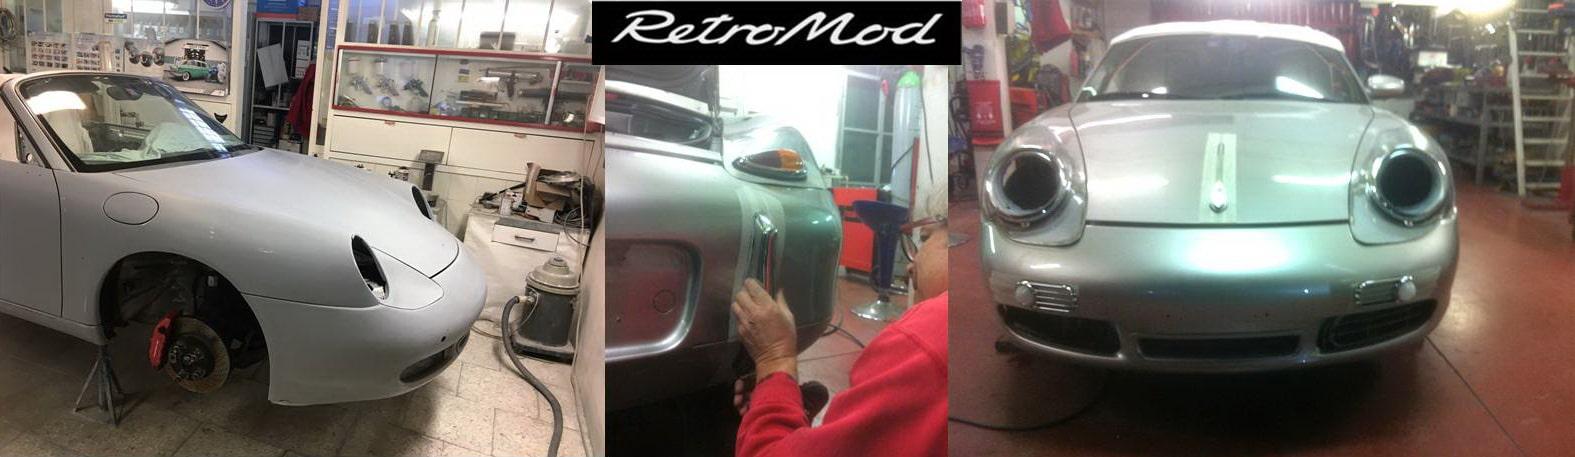 Porsche Boxster RetroMod Banner 4